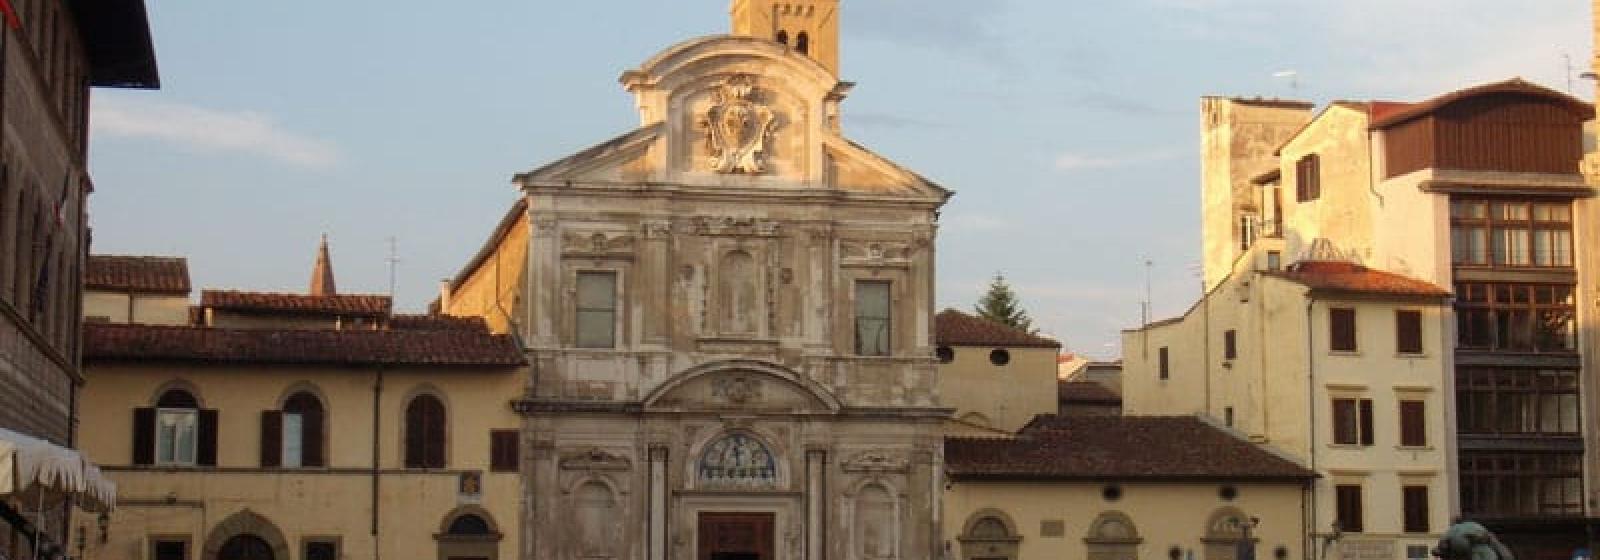 San Salvatore in Ognissanti